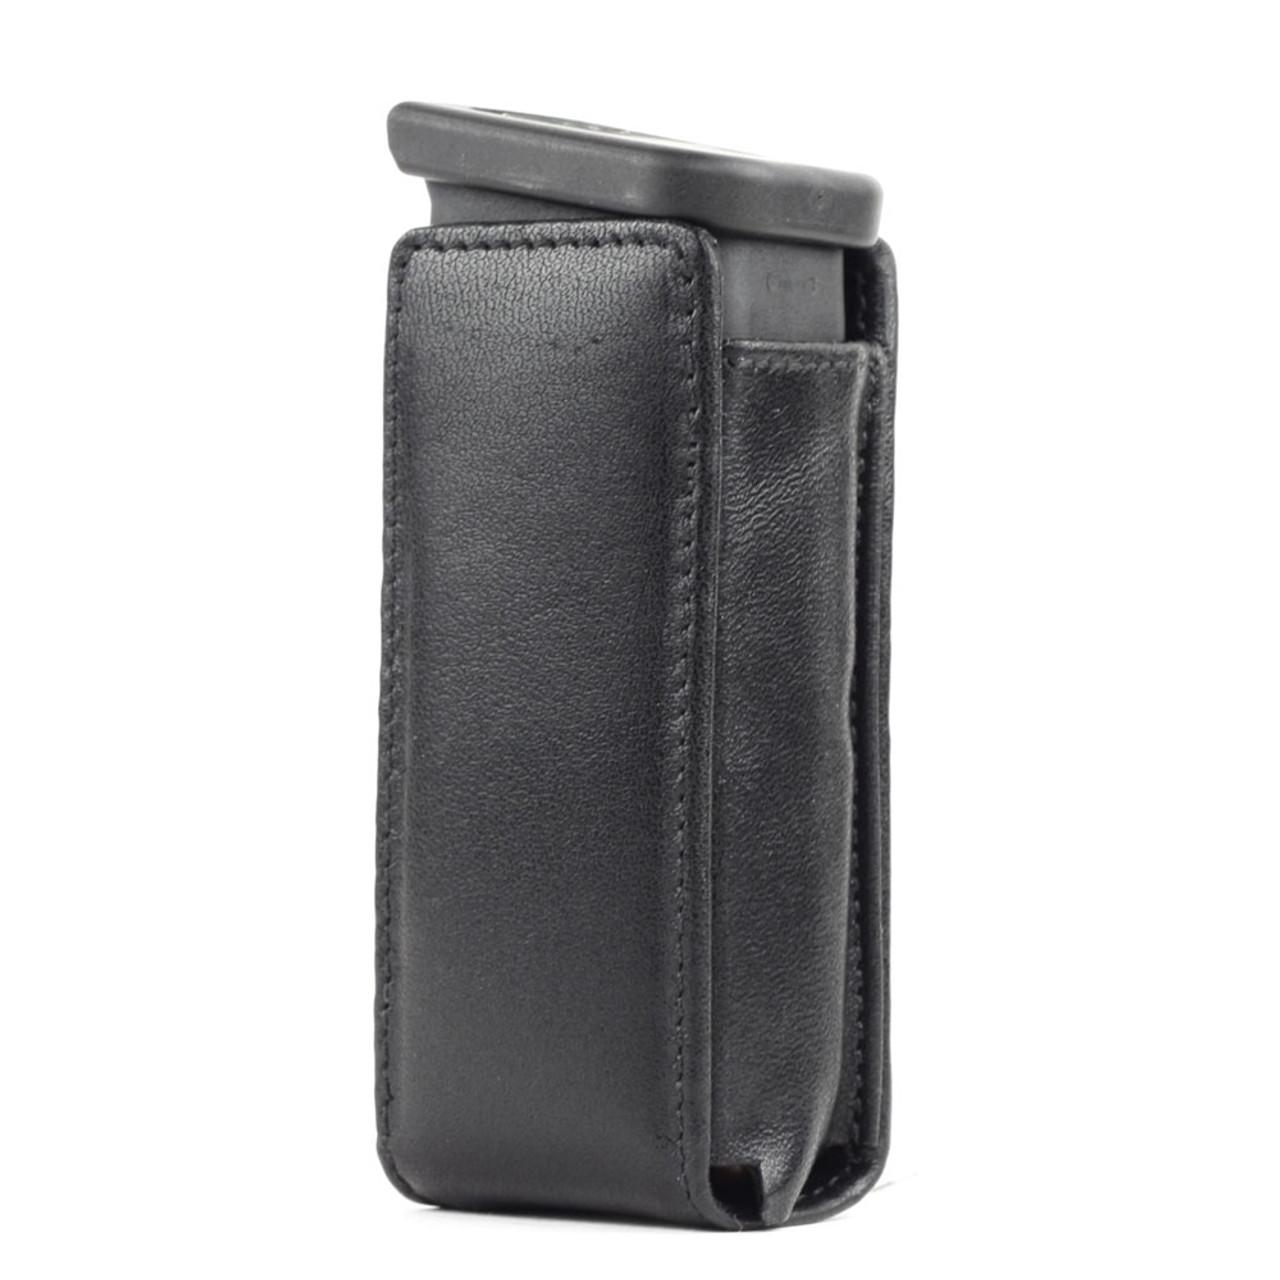 CZ 75 P07 Magazine Pocket Protector